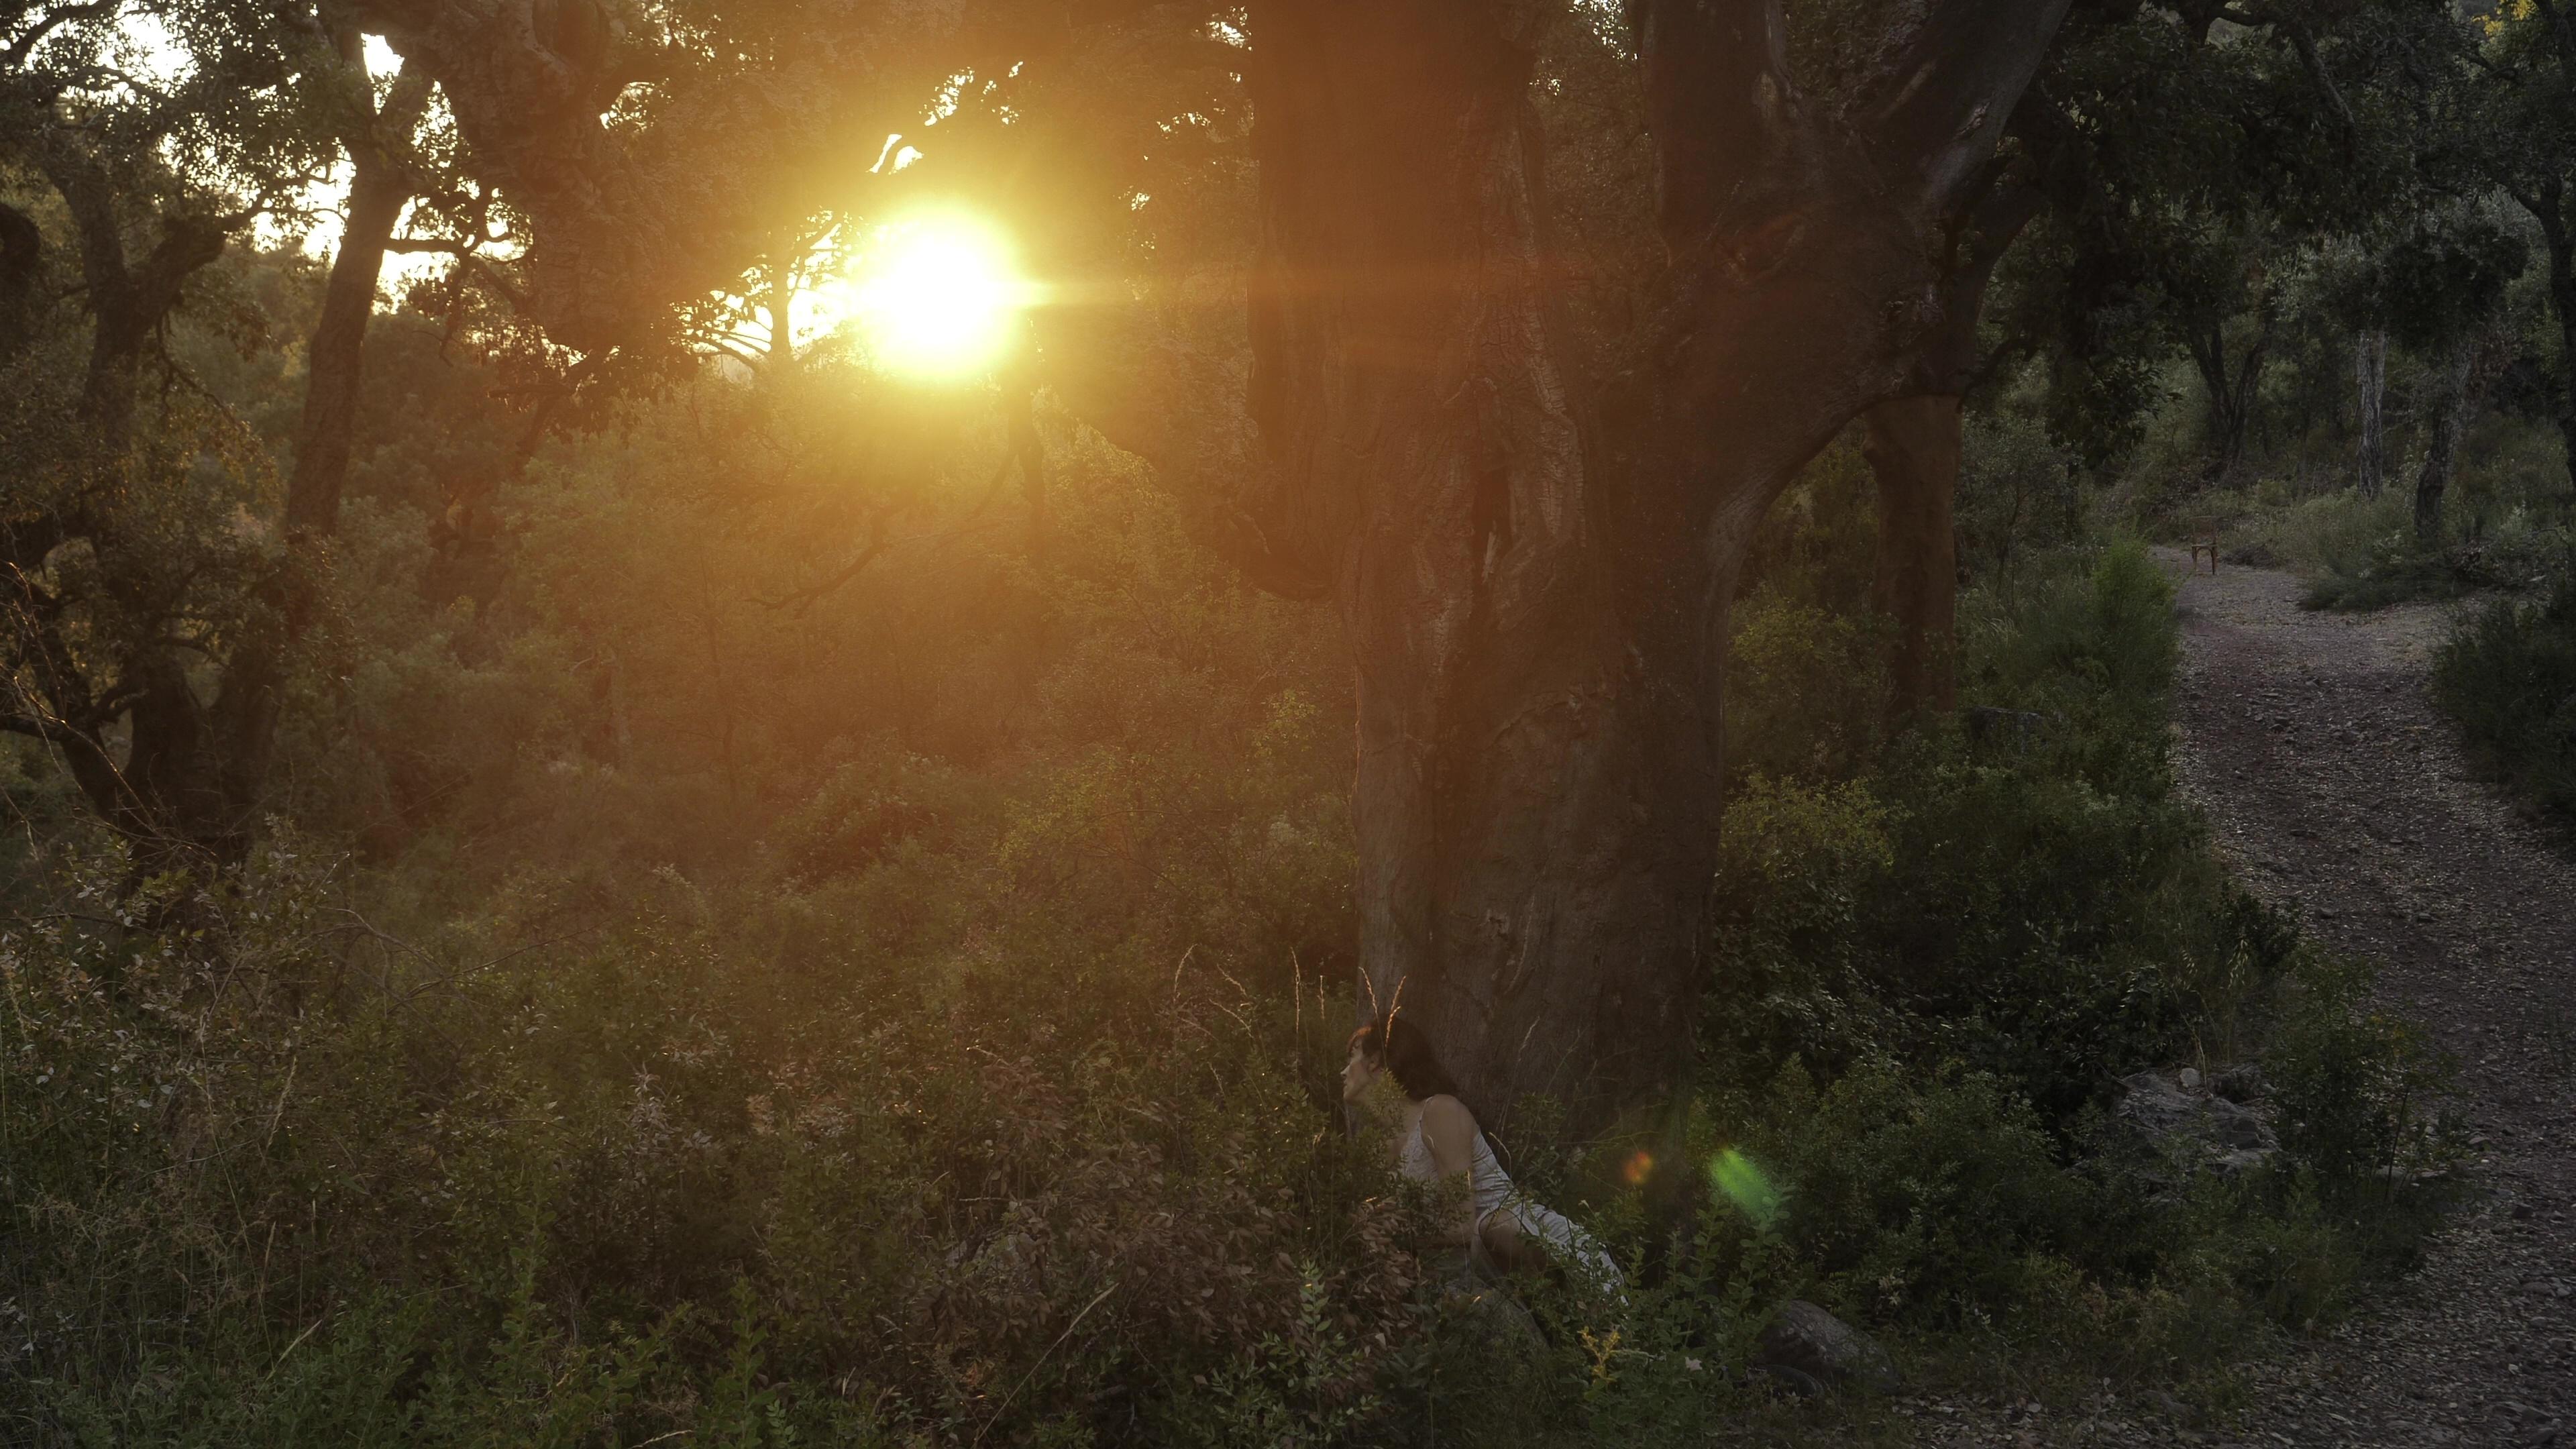 Sehnsuchtsdämmerung – El ocaso del anhelo